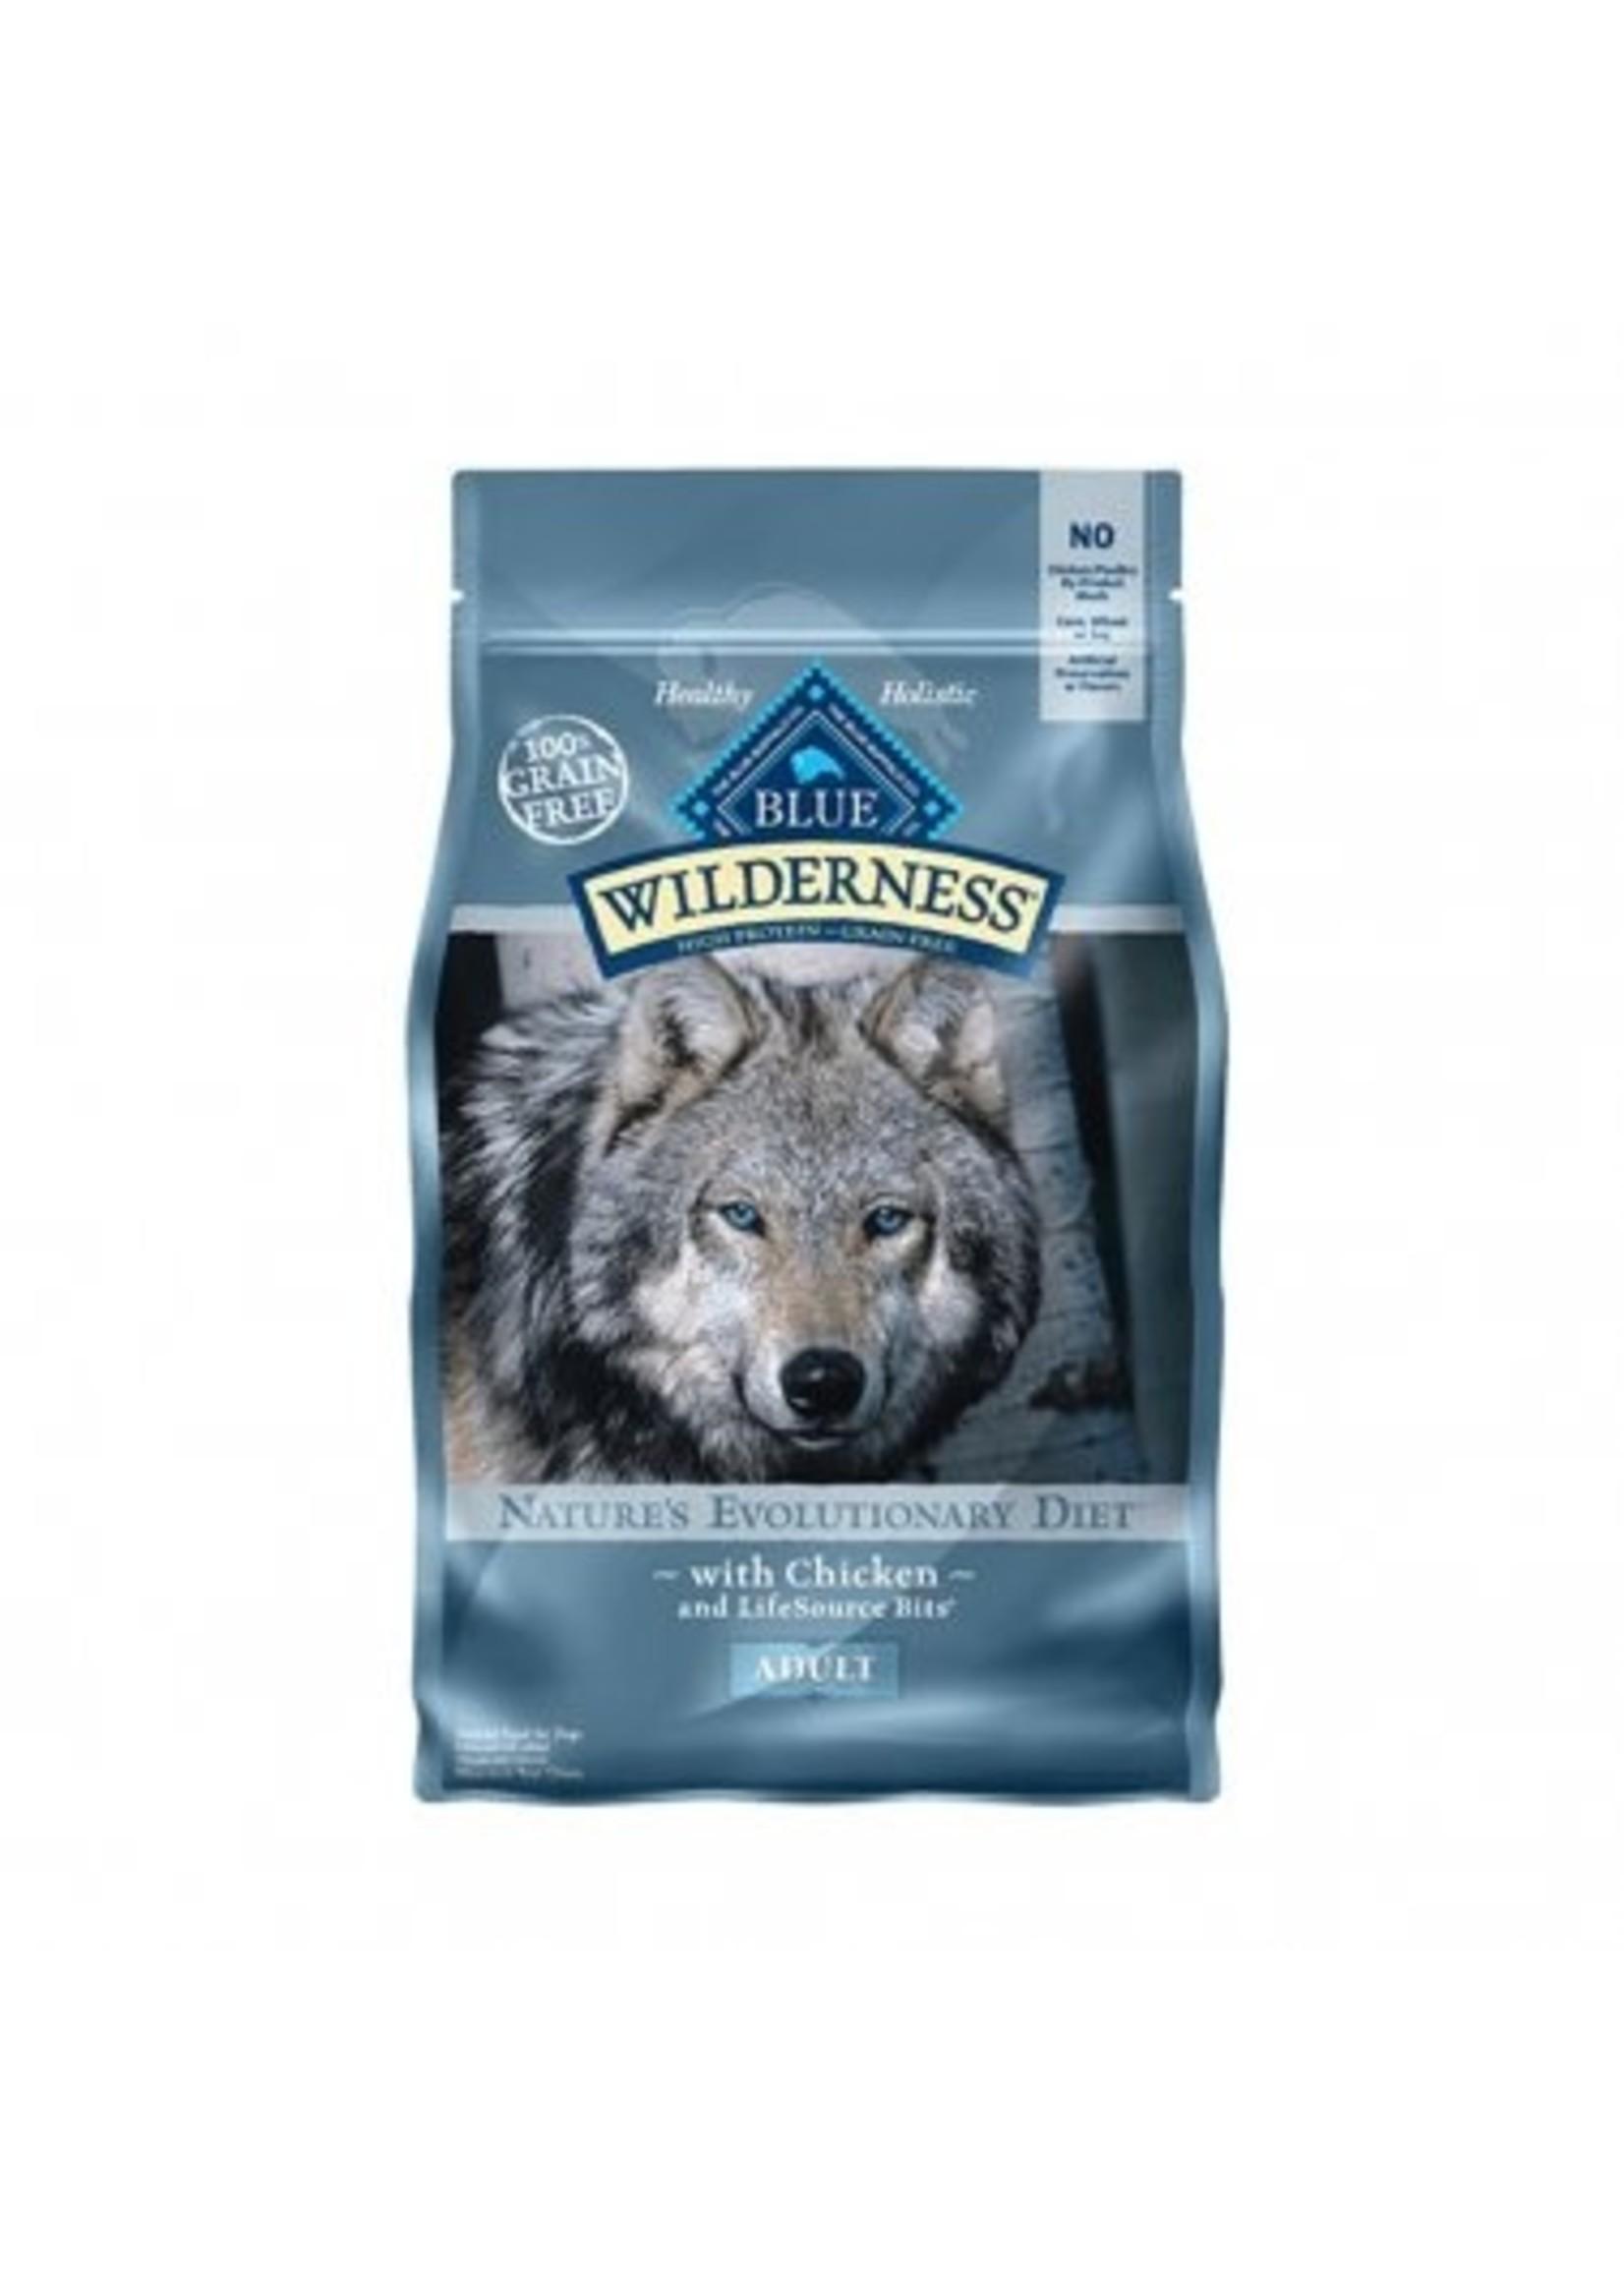 Blue Buffalo Blue Wilderness™ Nature's Evolutionary Diet Grain Free Chicken Adult Dog Food 24 Lbs